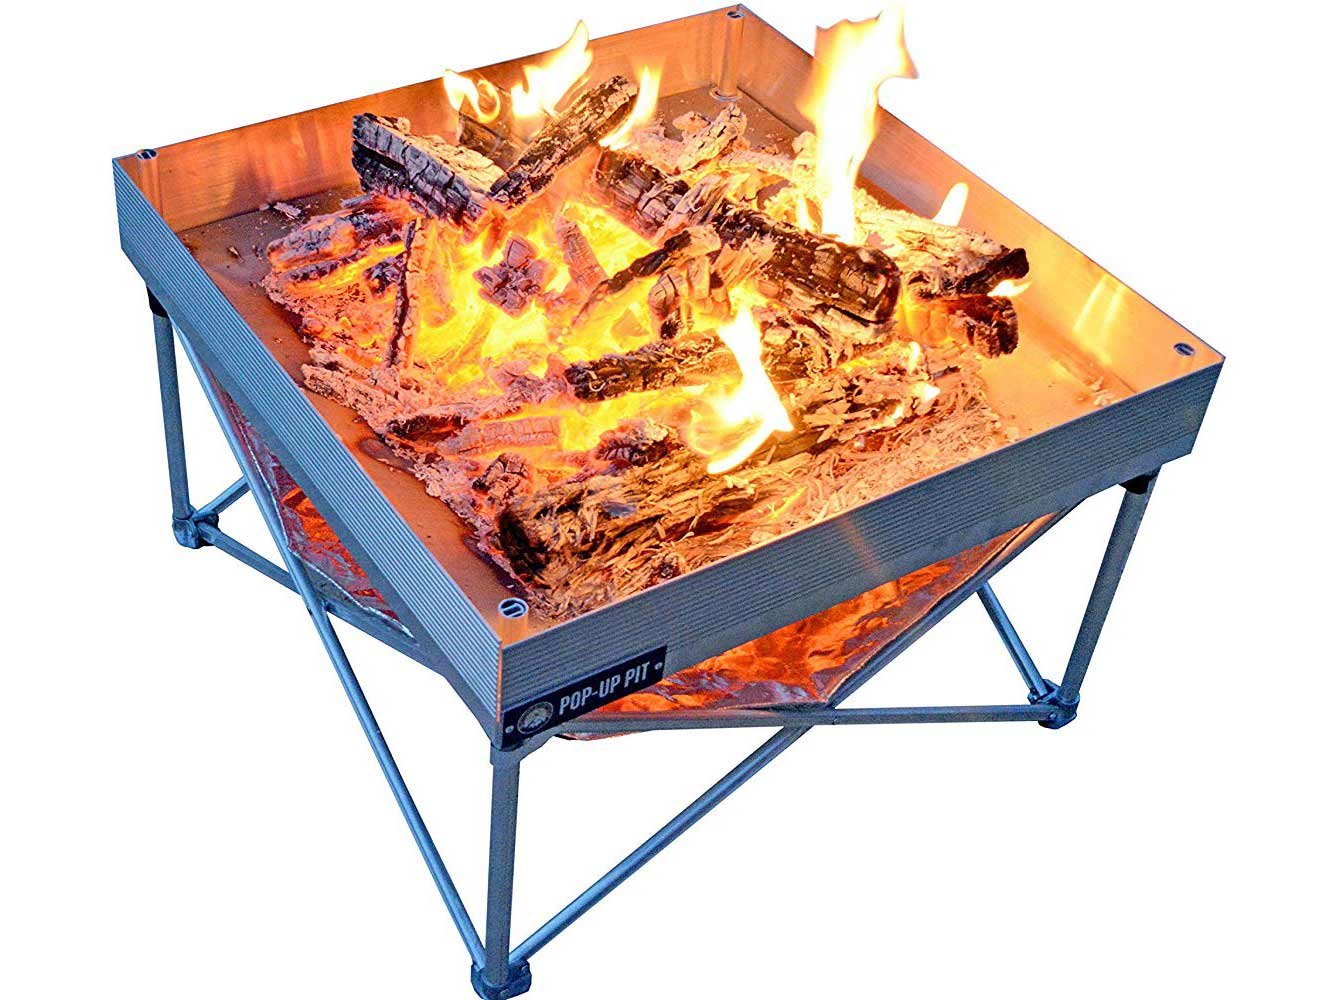 Fireside Pop Up Fire Pit